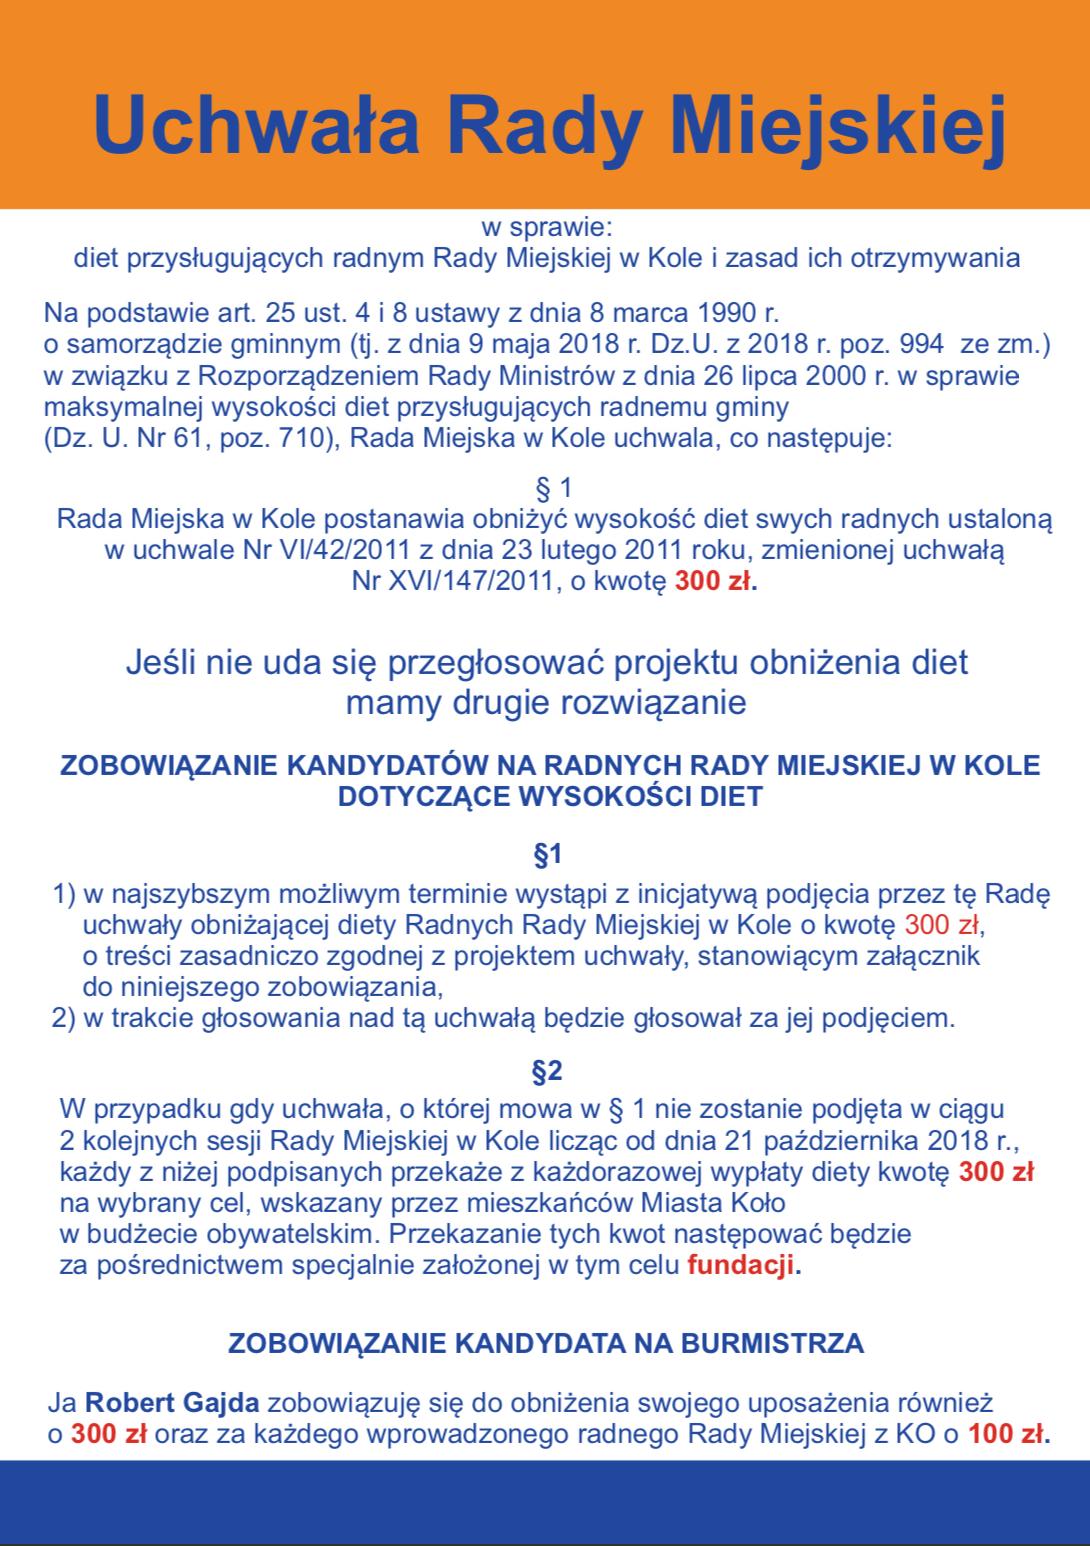 2f425e13d8dcc Zrzut ekranu 2018-10-12 o 15.26.15 - OkrągłeMiasto.pl